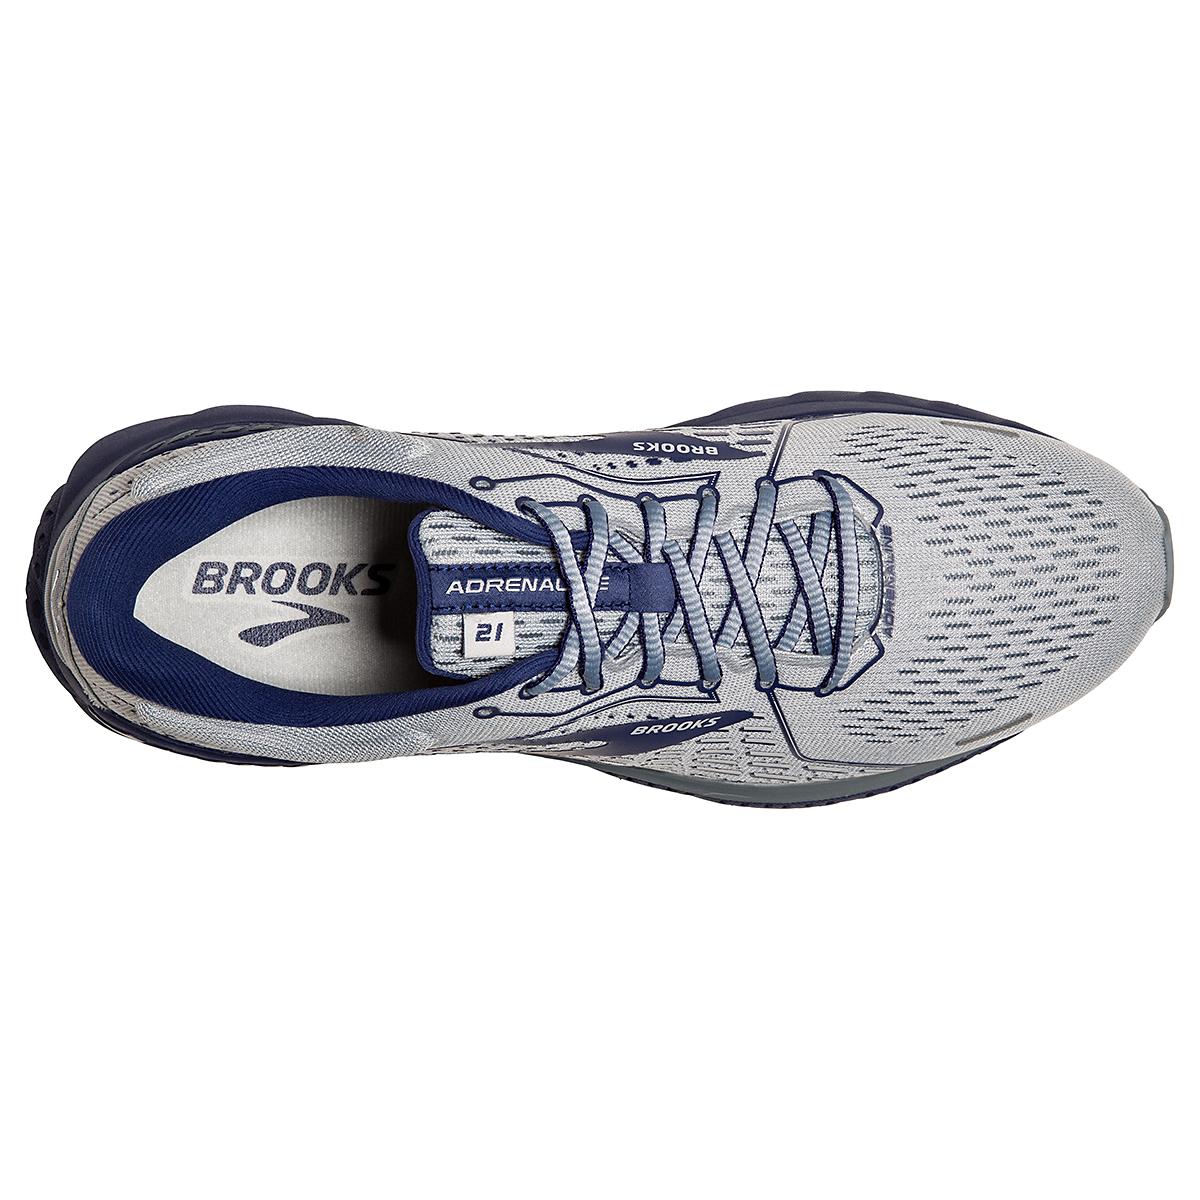 Men's Brooks Adrenaline GTS 21 Running Shoe - Color: Grey/Tradewinds - Size: 7 - Width: Regular, Grey/Tradewinds, large, image 5